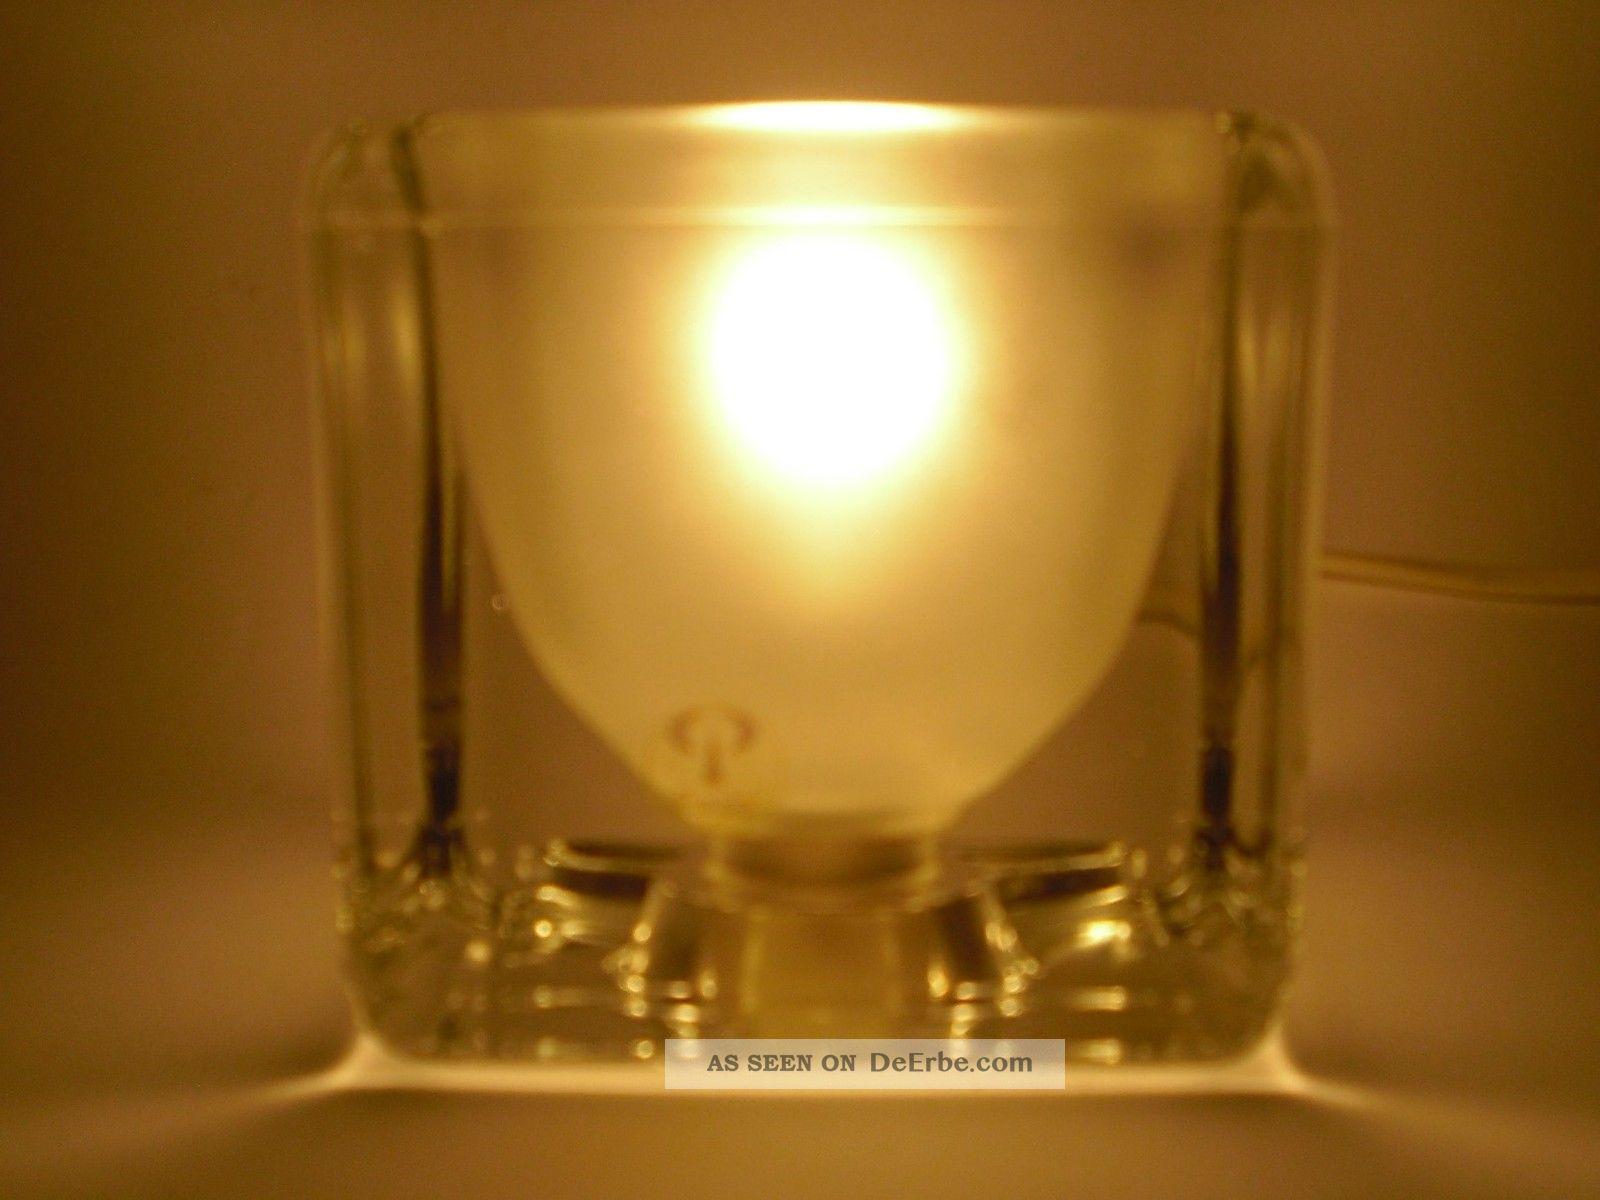 peill putzler tischlampe glas lampe ice cube ta14 design. Black Bedroom Furniture Sets. Home Design Ideas